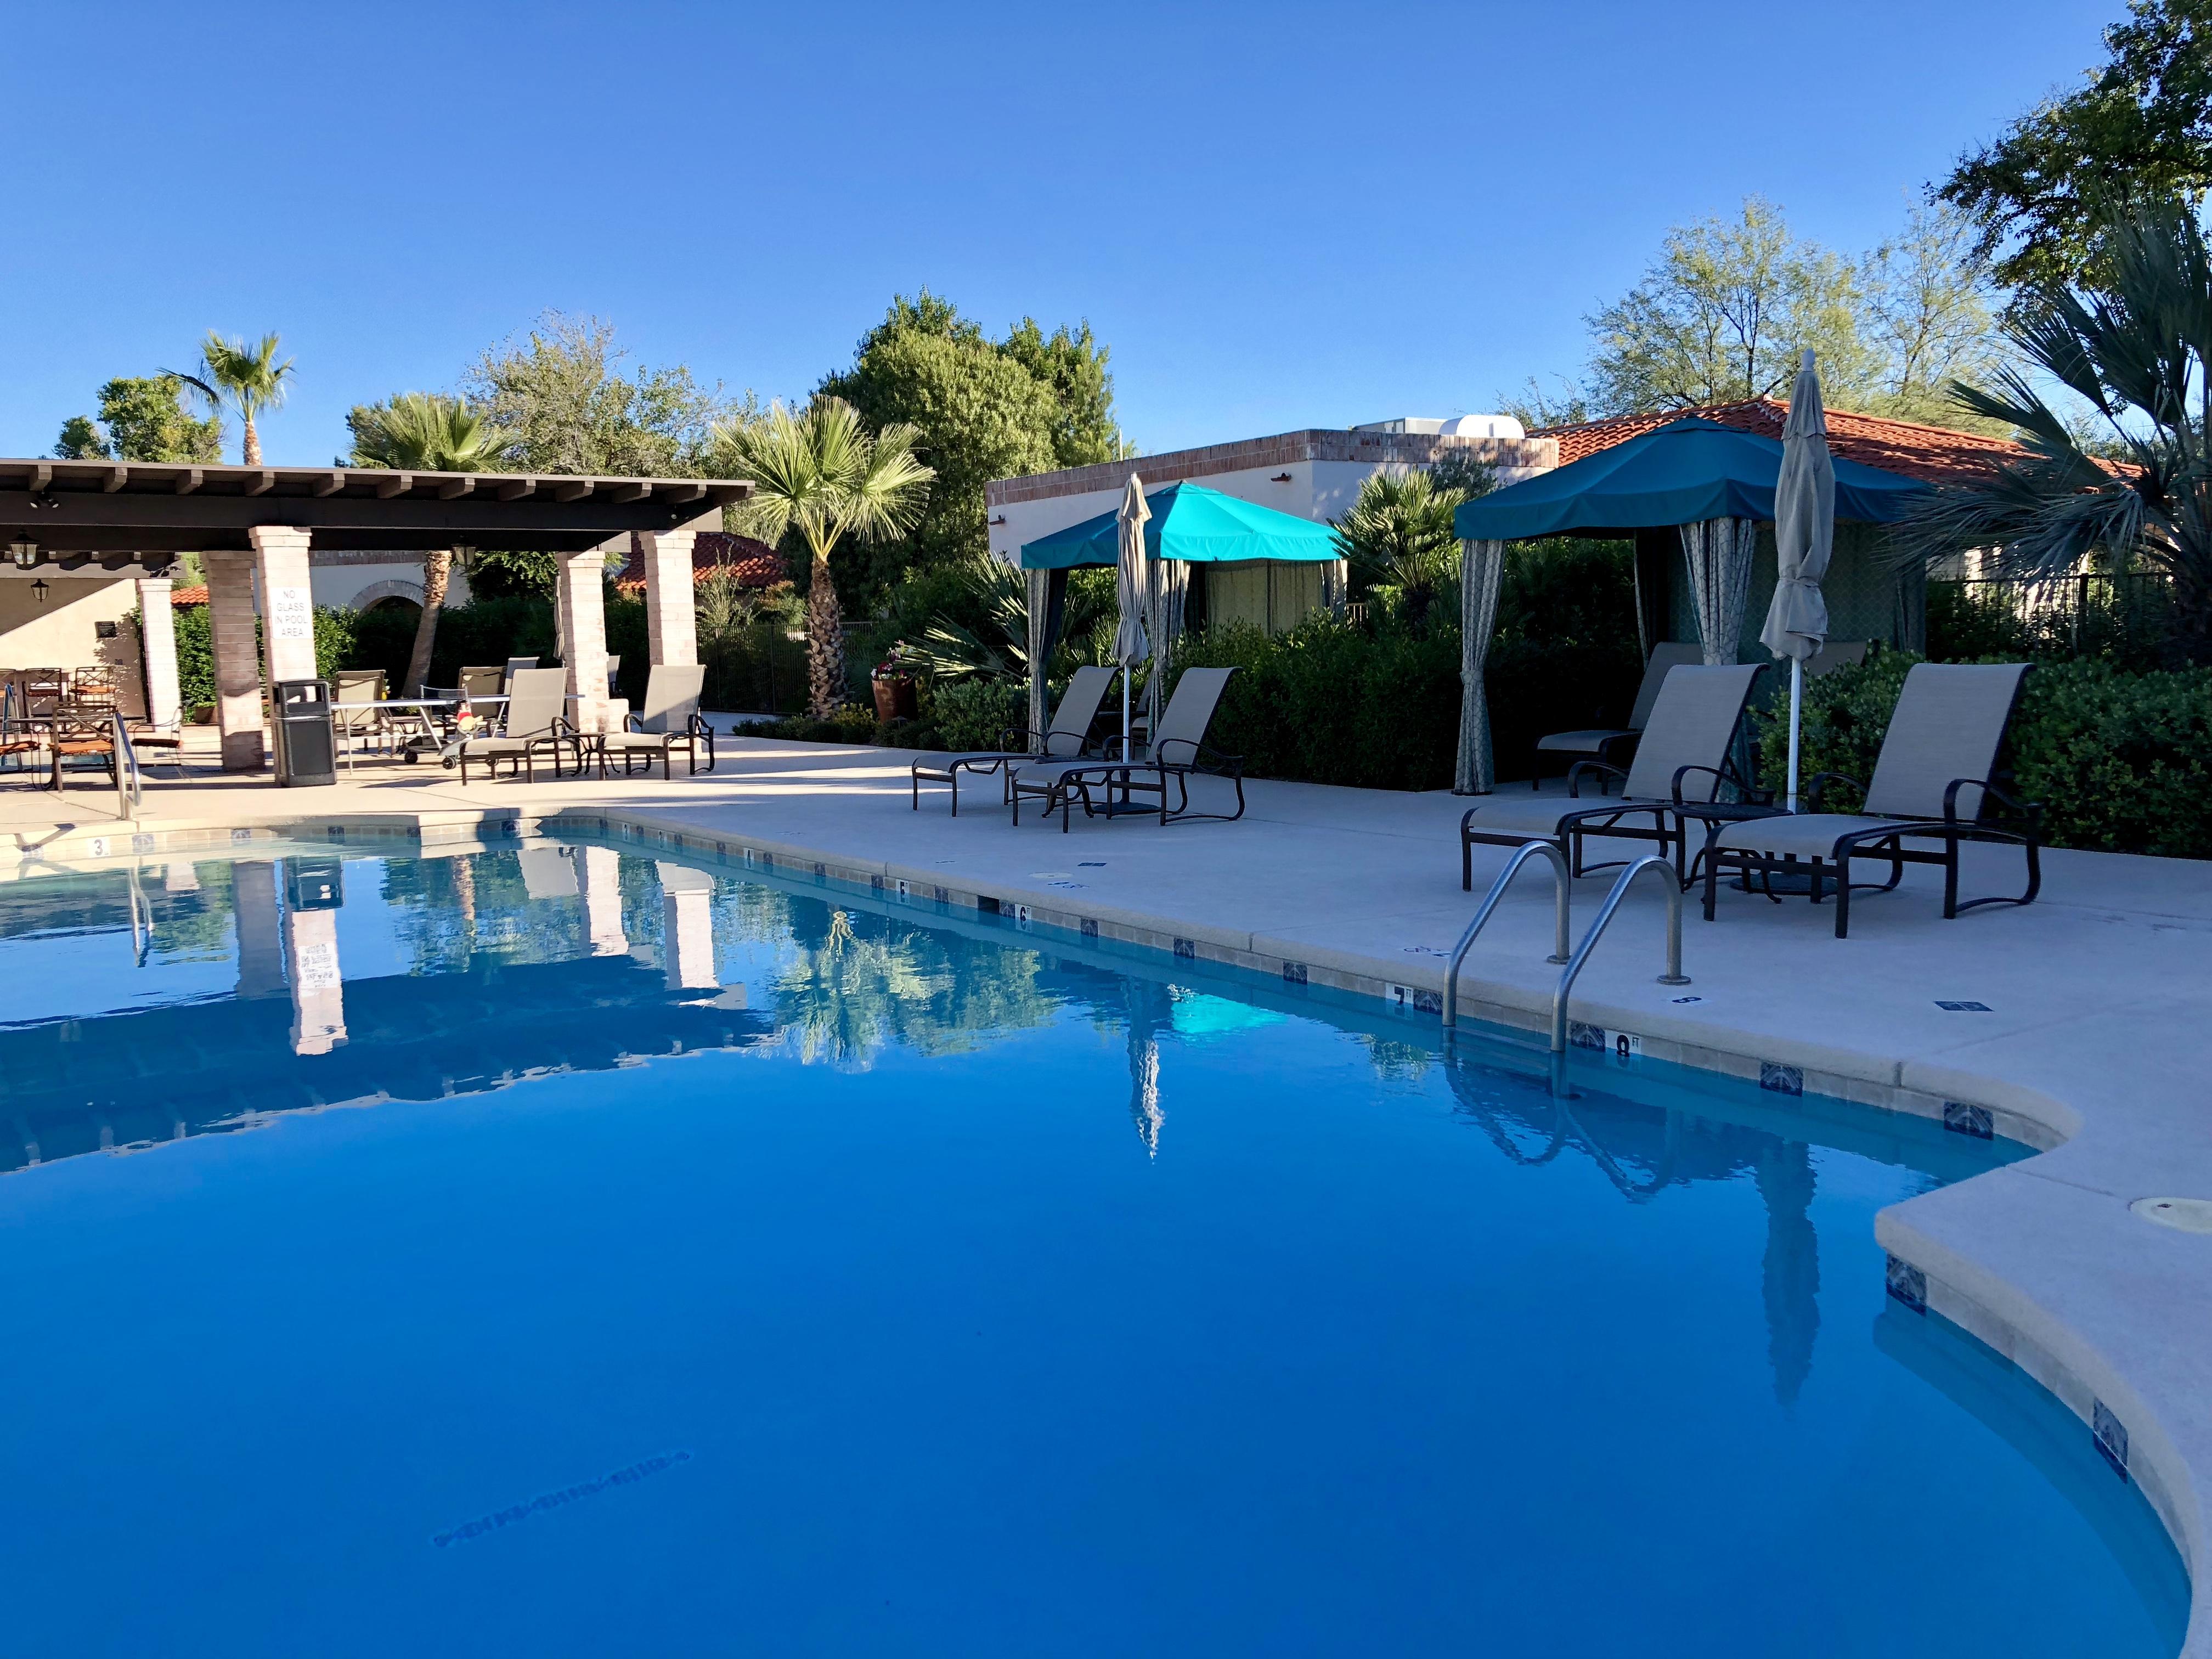 Pool and Cabanaas